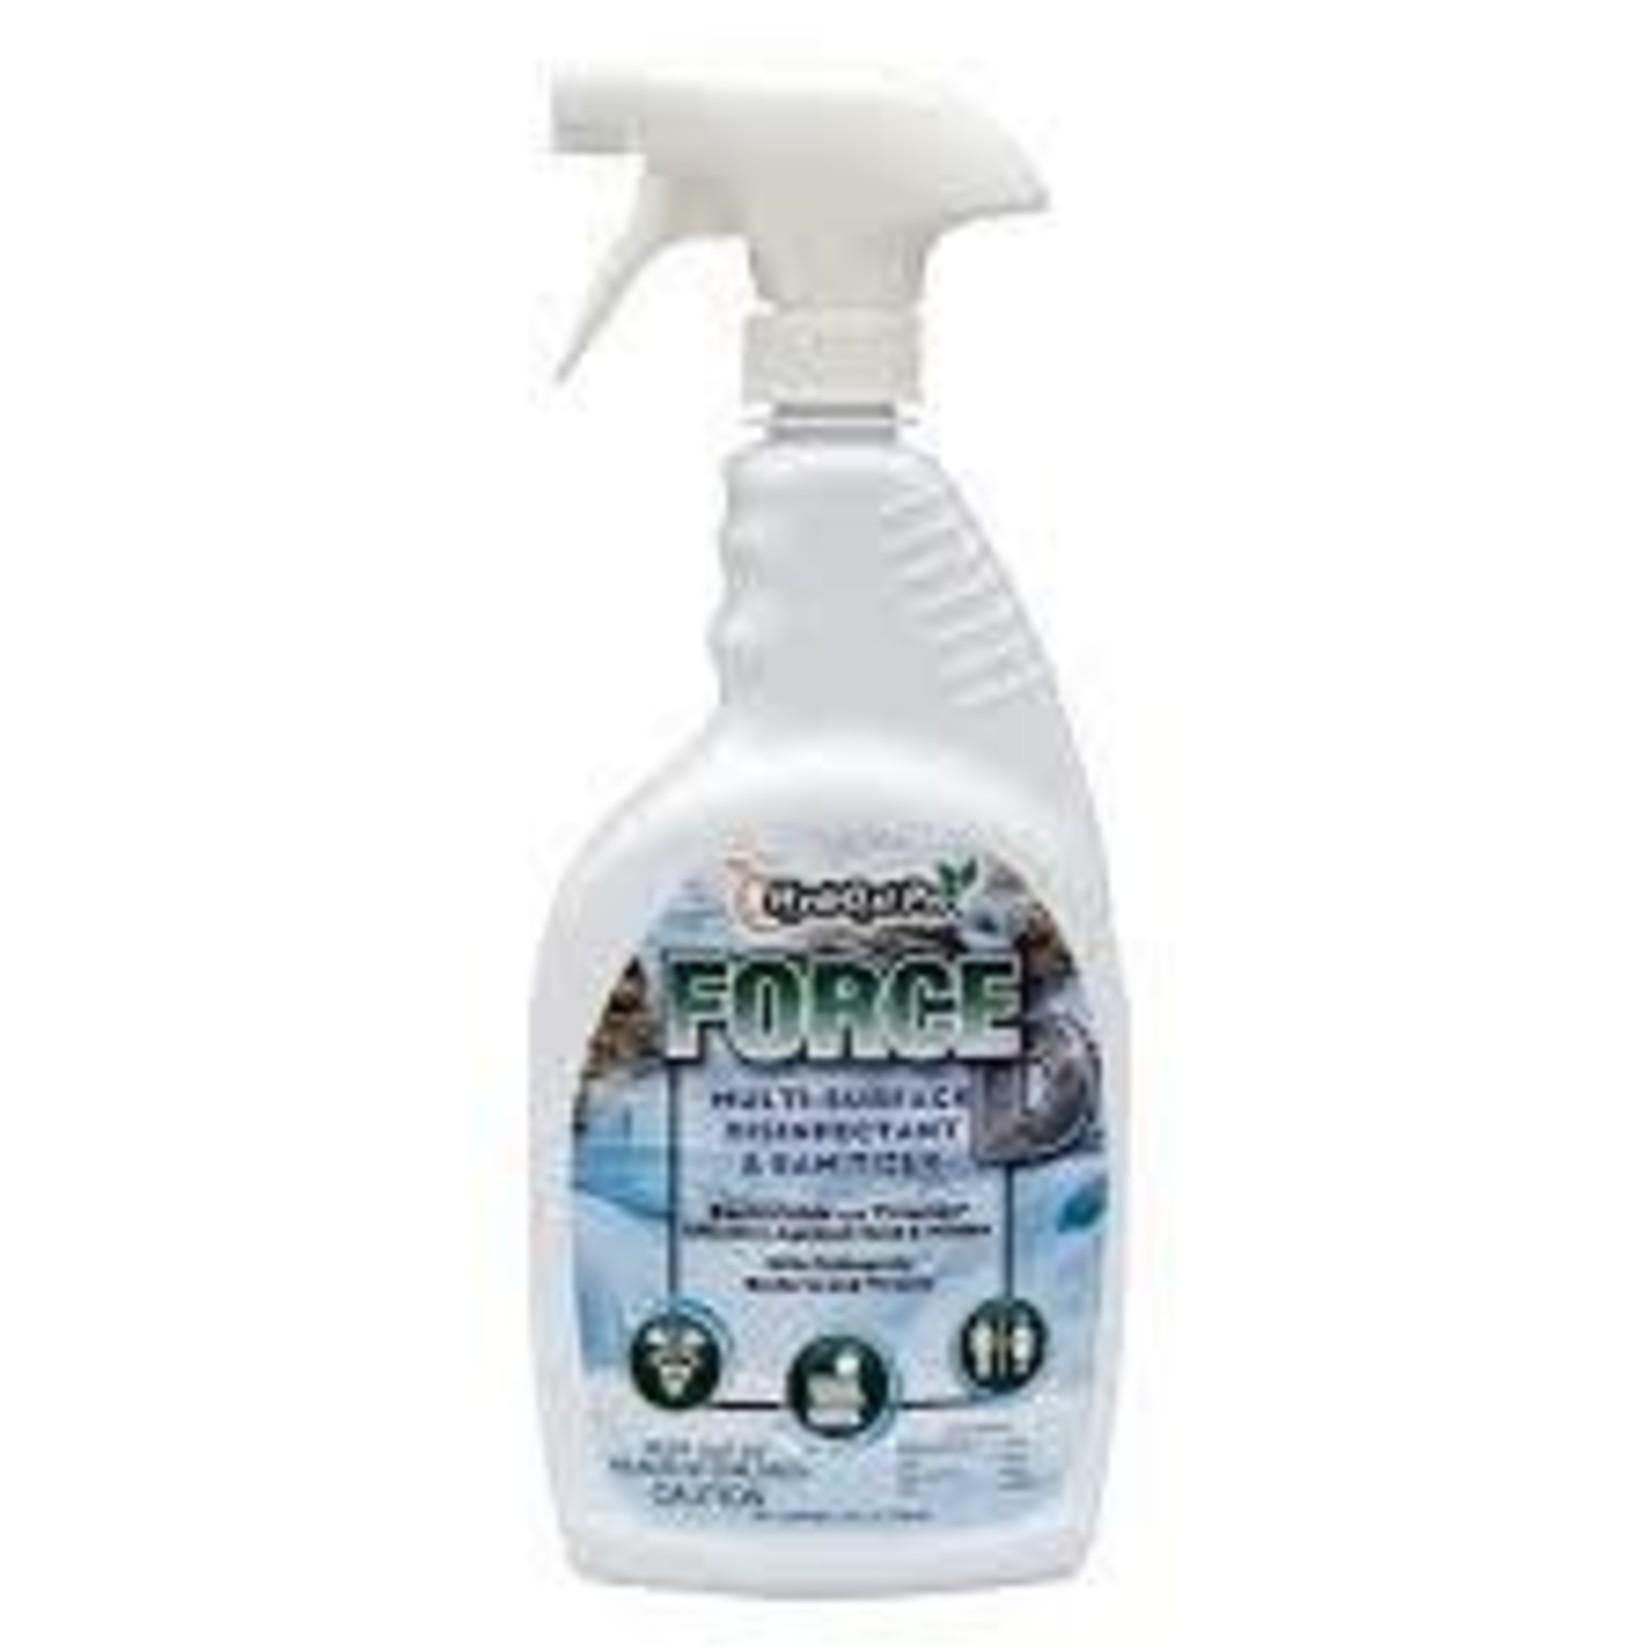 CORE Products Core Force D Disinfectant - 32oz